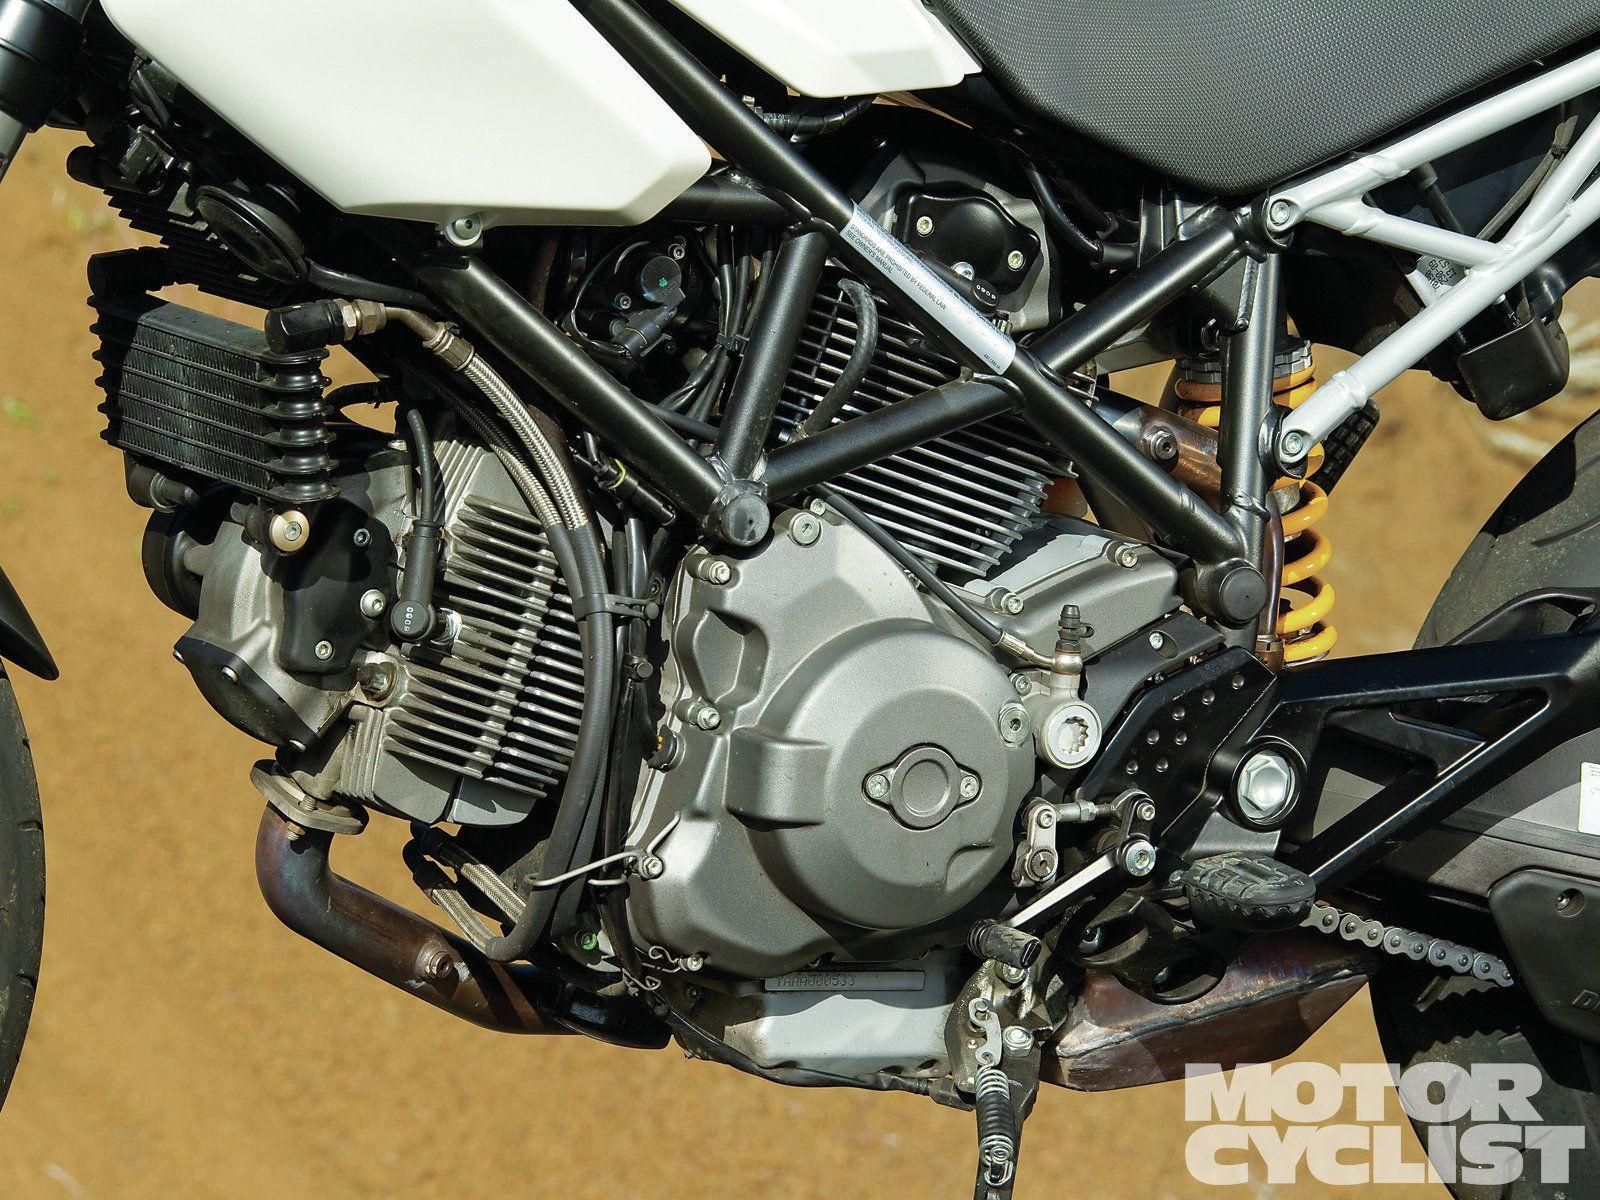 ducati hypermotard 796 | motorcyclist